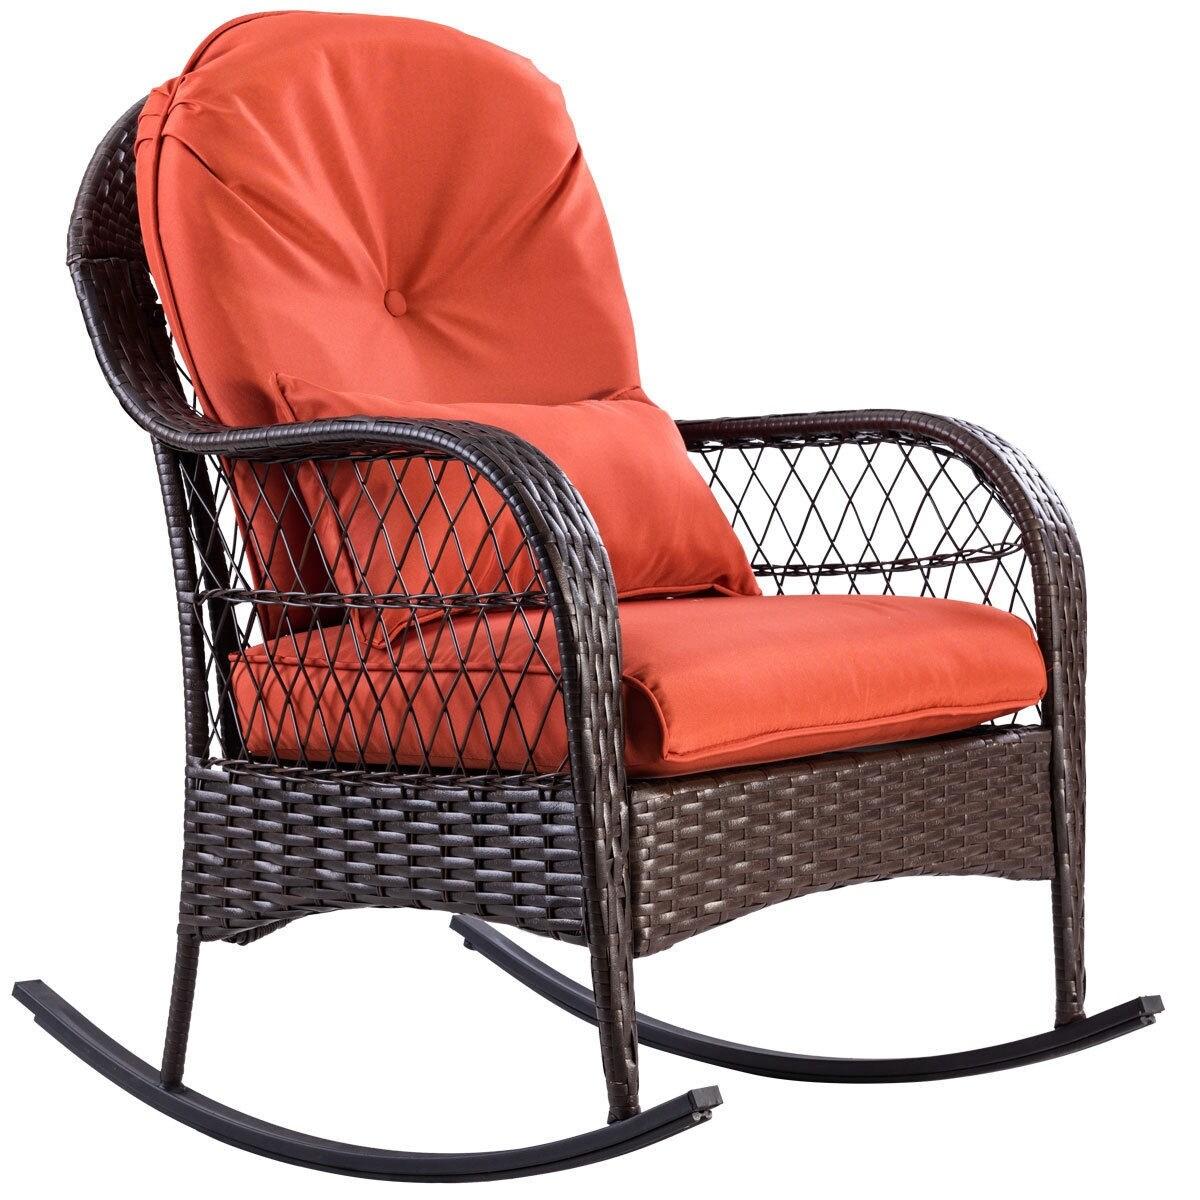 Shop Gymax Patio Rattan Wicker Rocking Chair Porch Deck Rocker